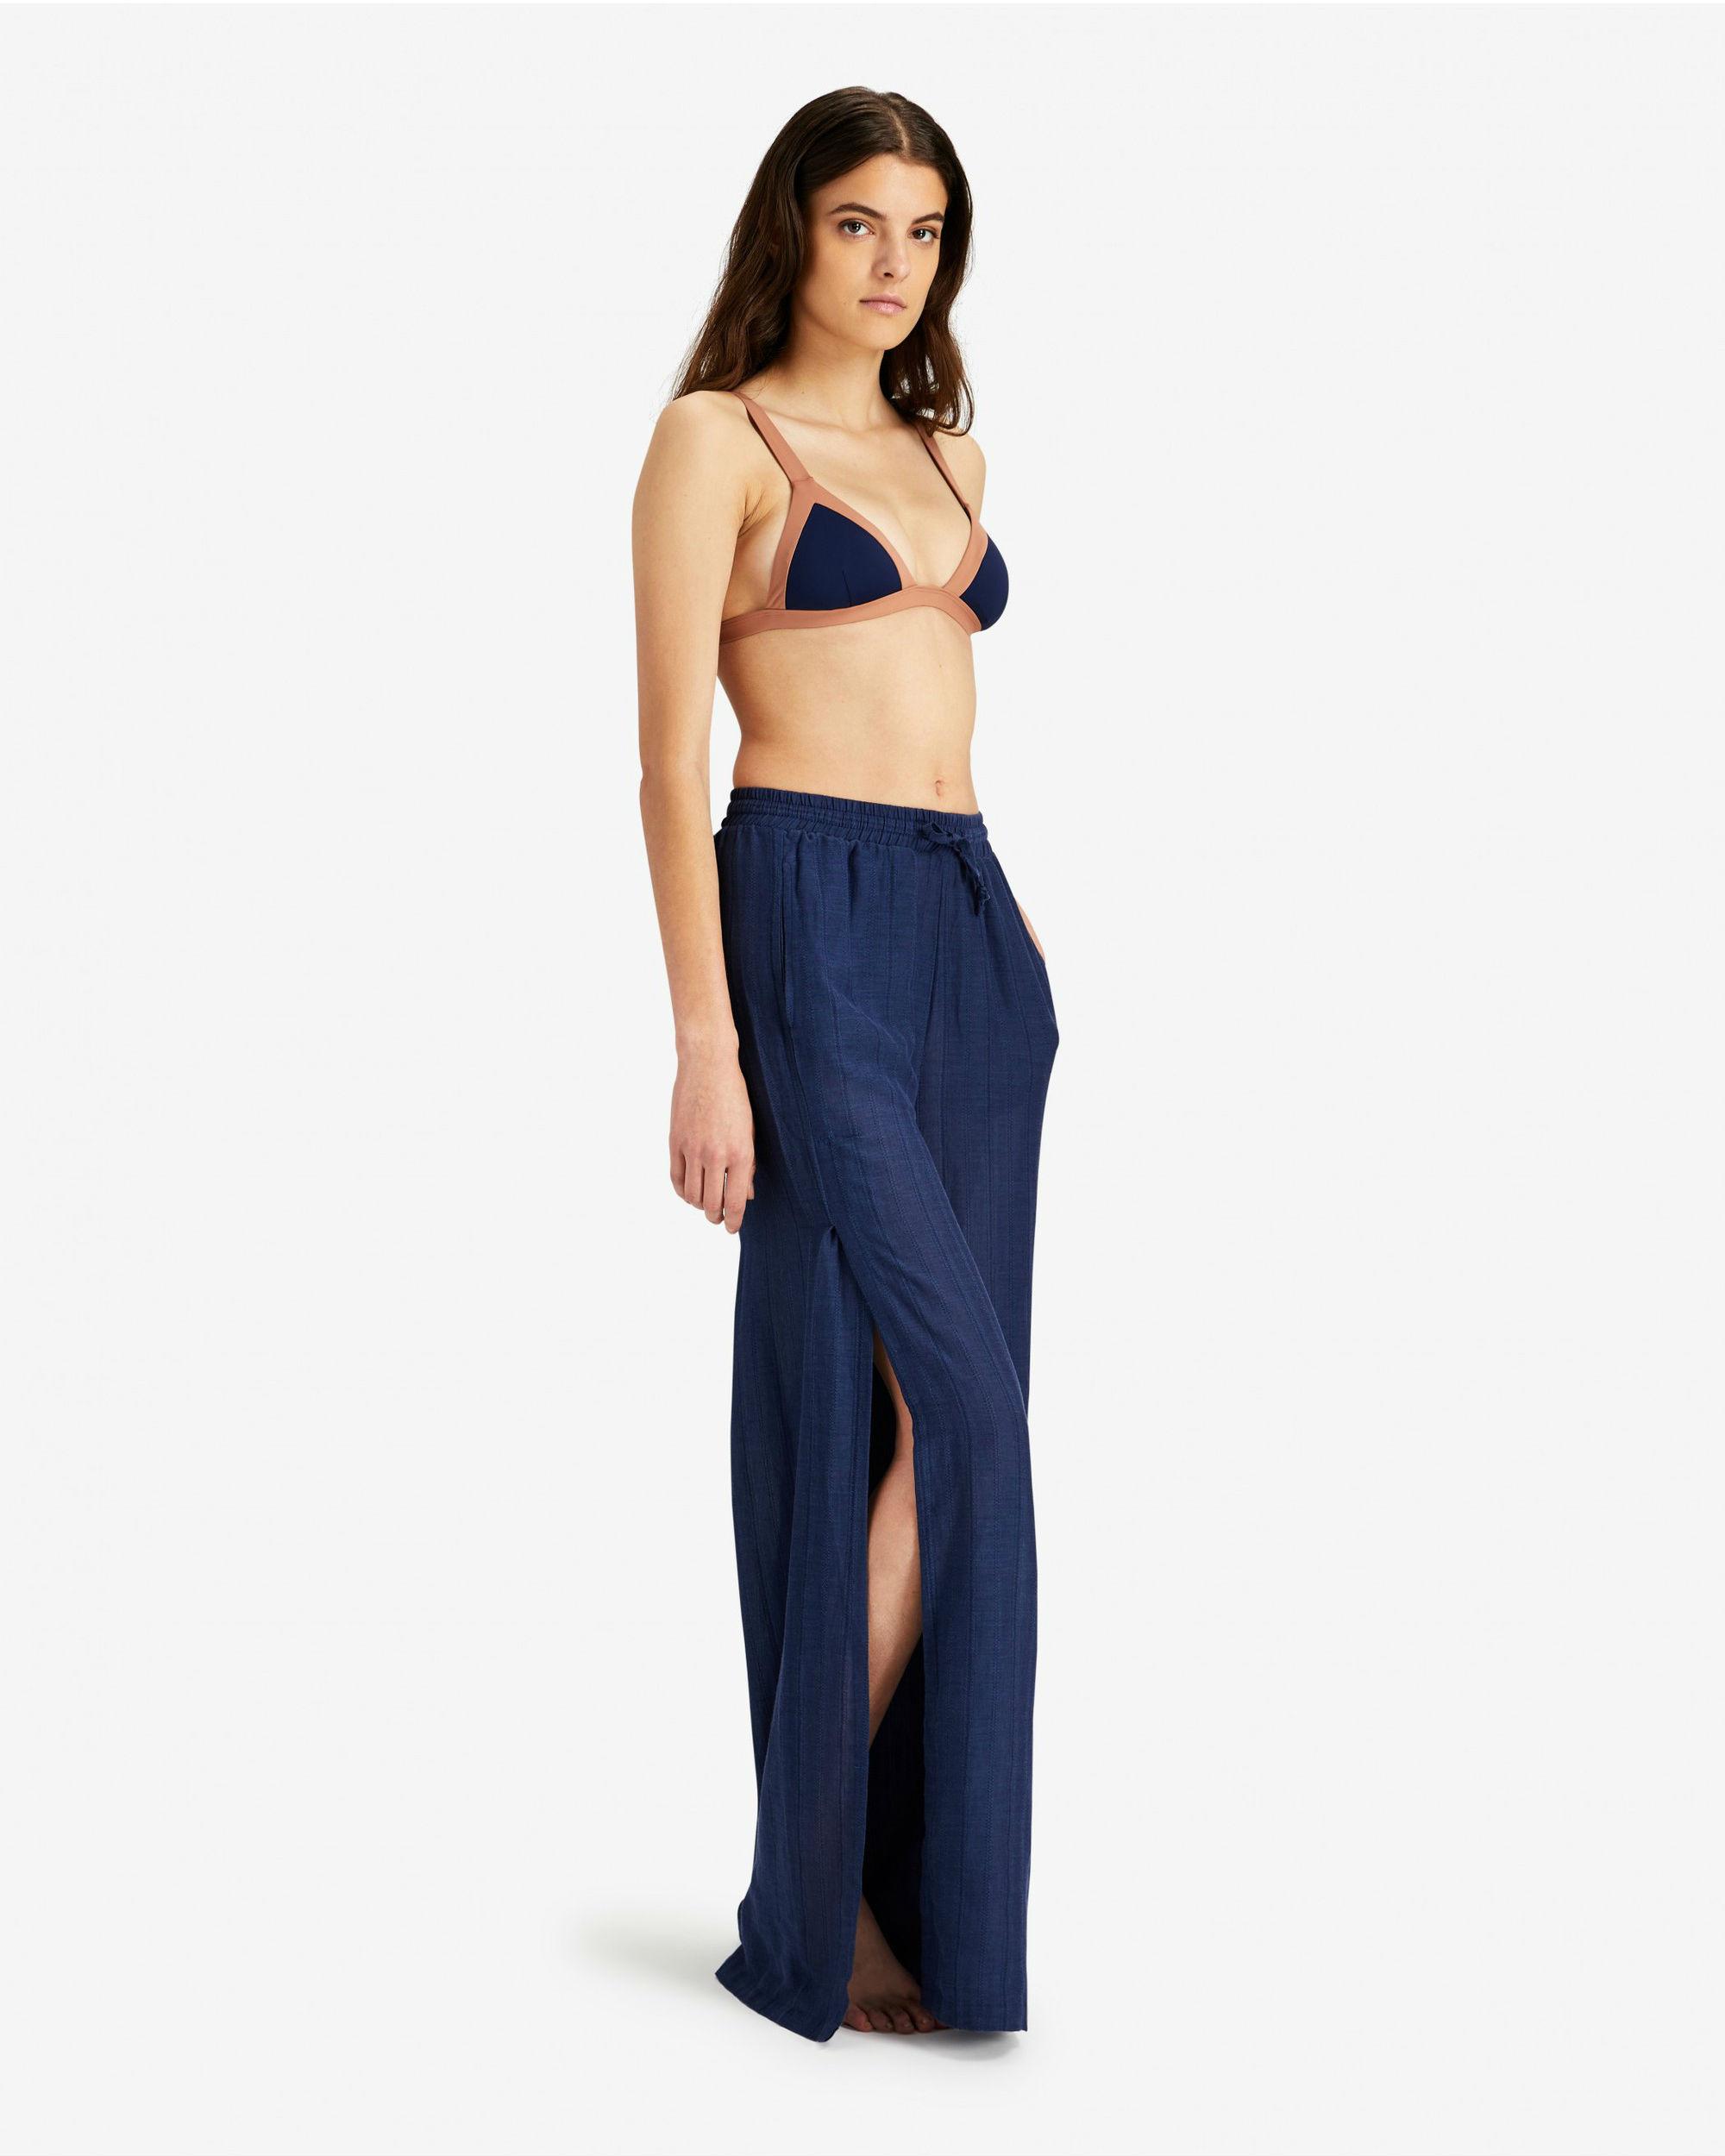 Chloe Wide Leg Beach Pant